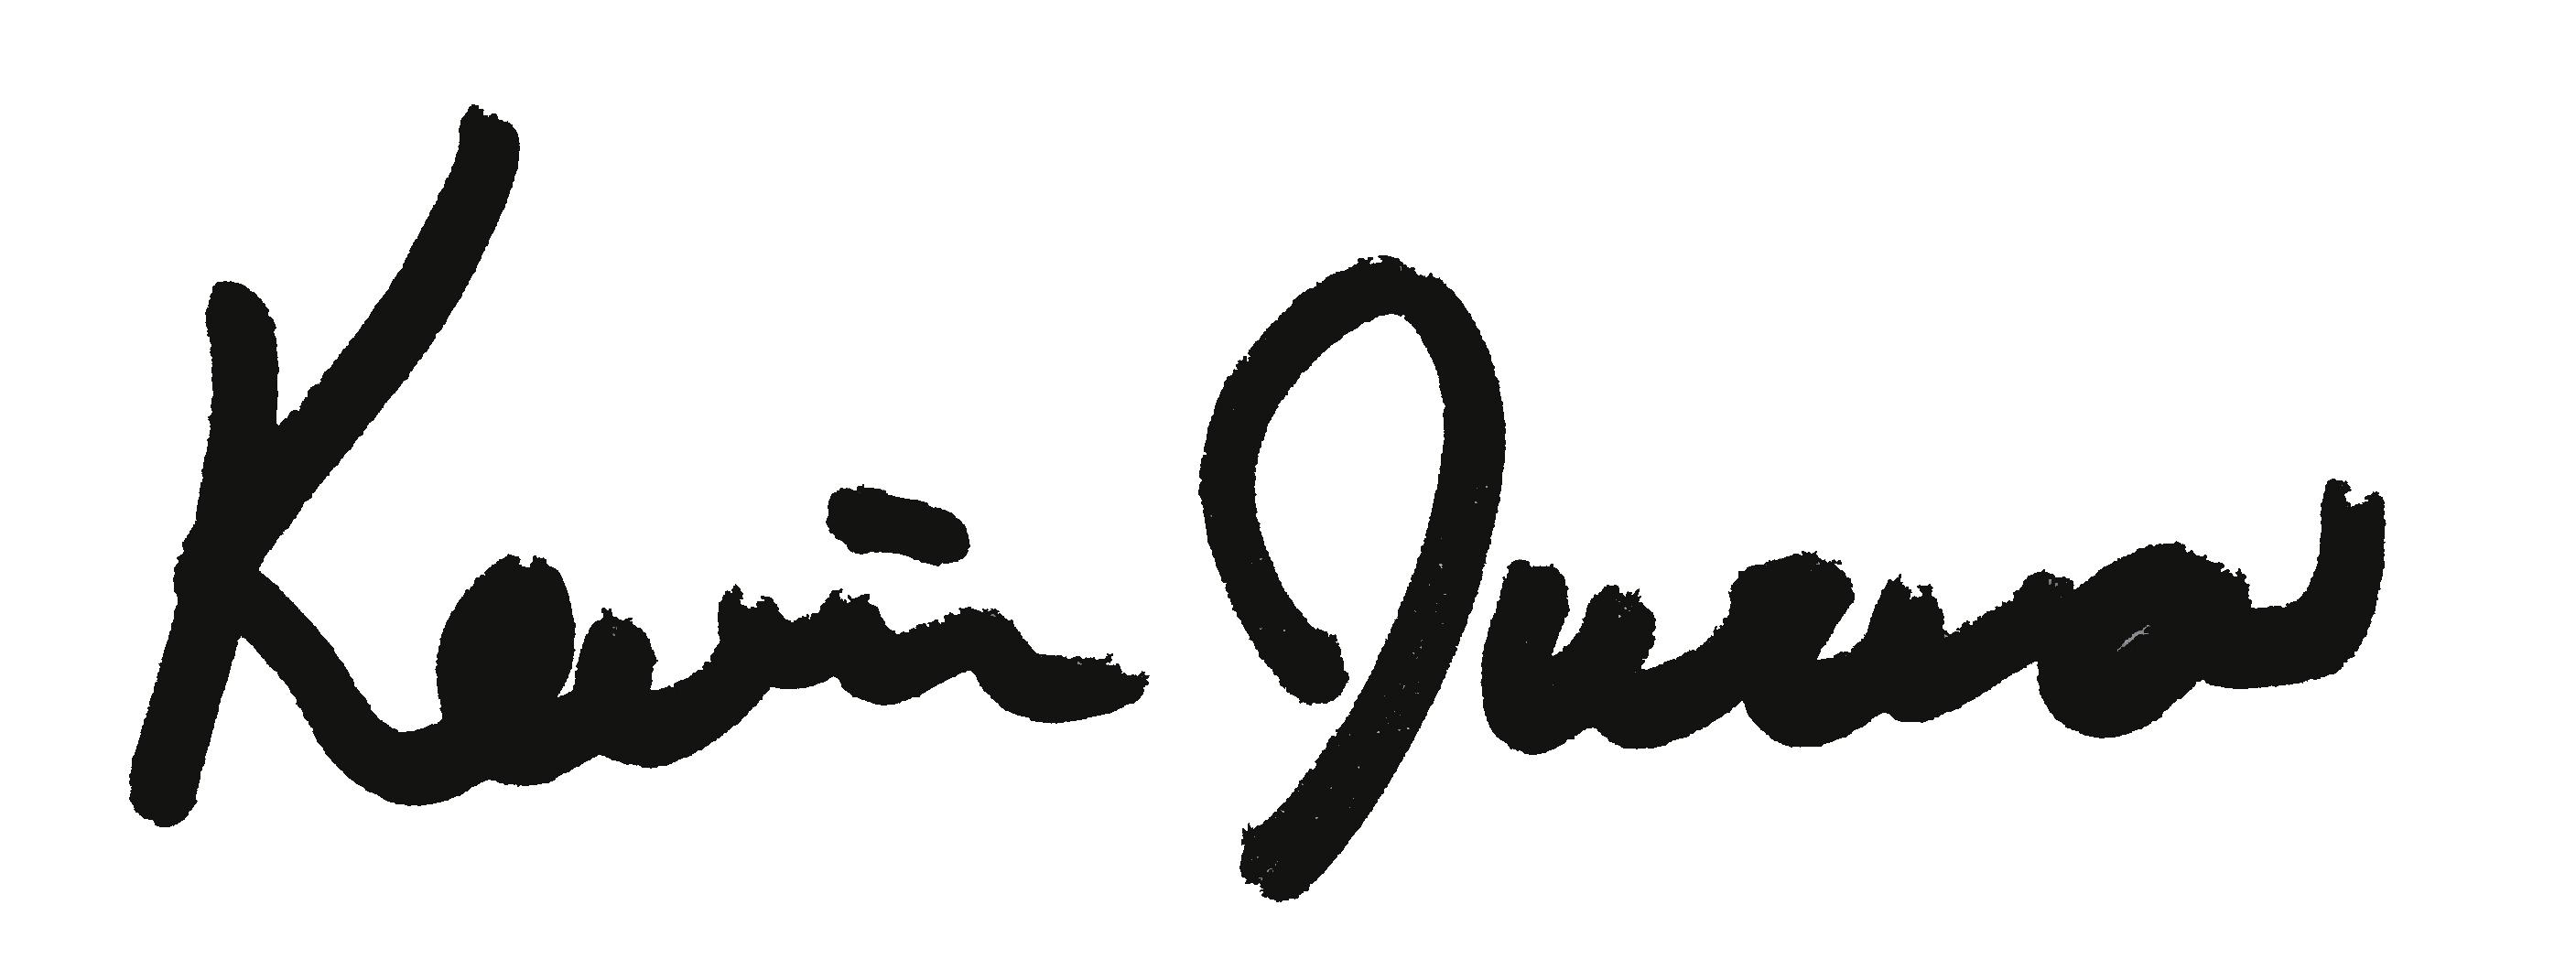 Kevin Jurva's Signature